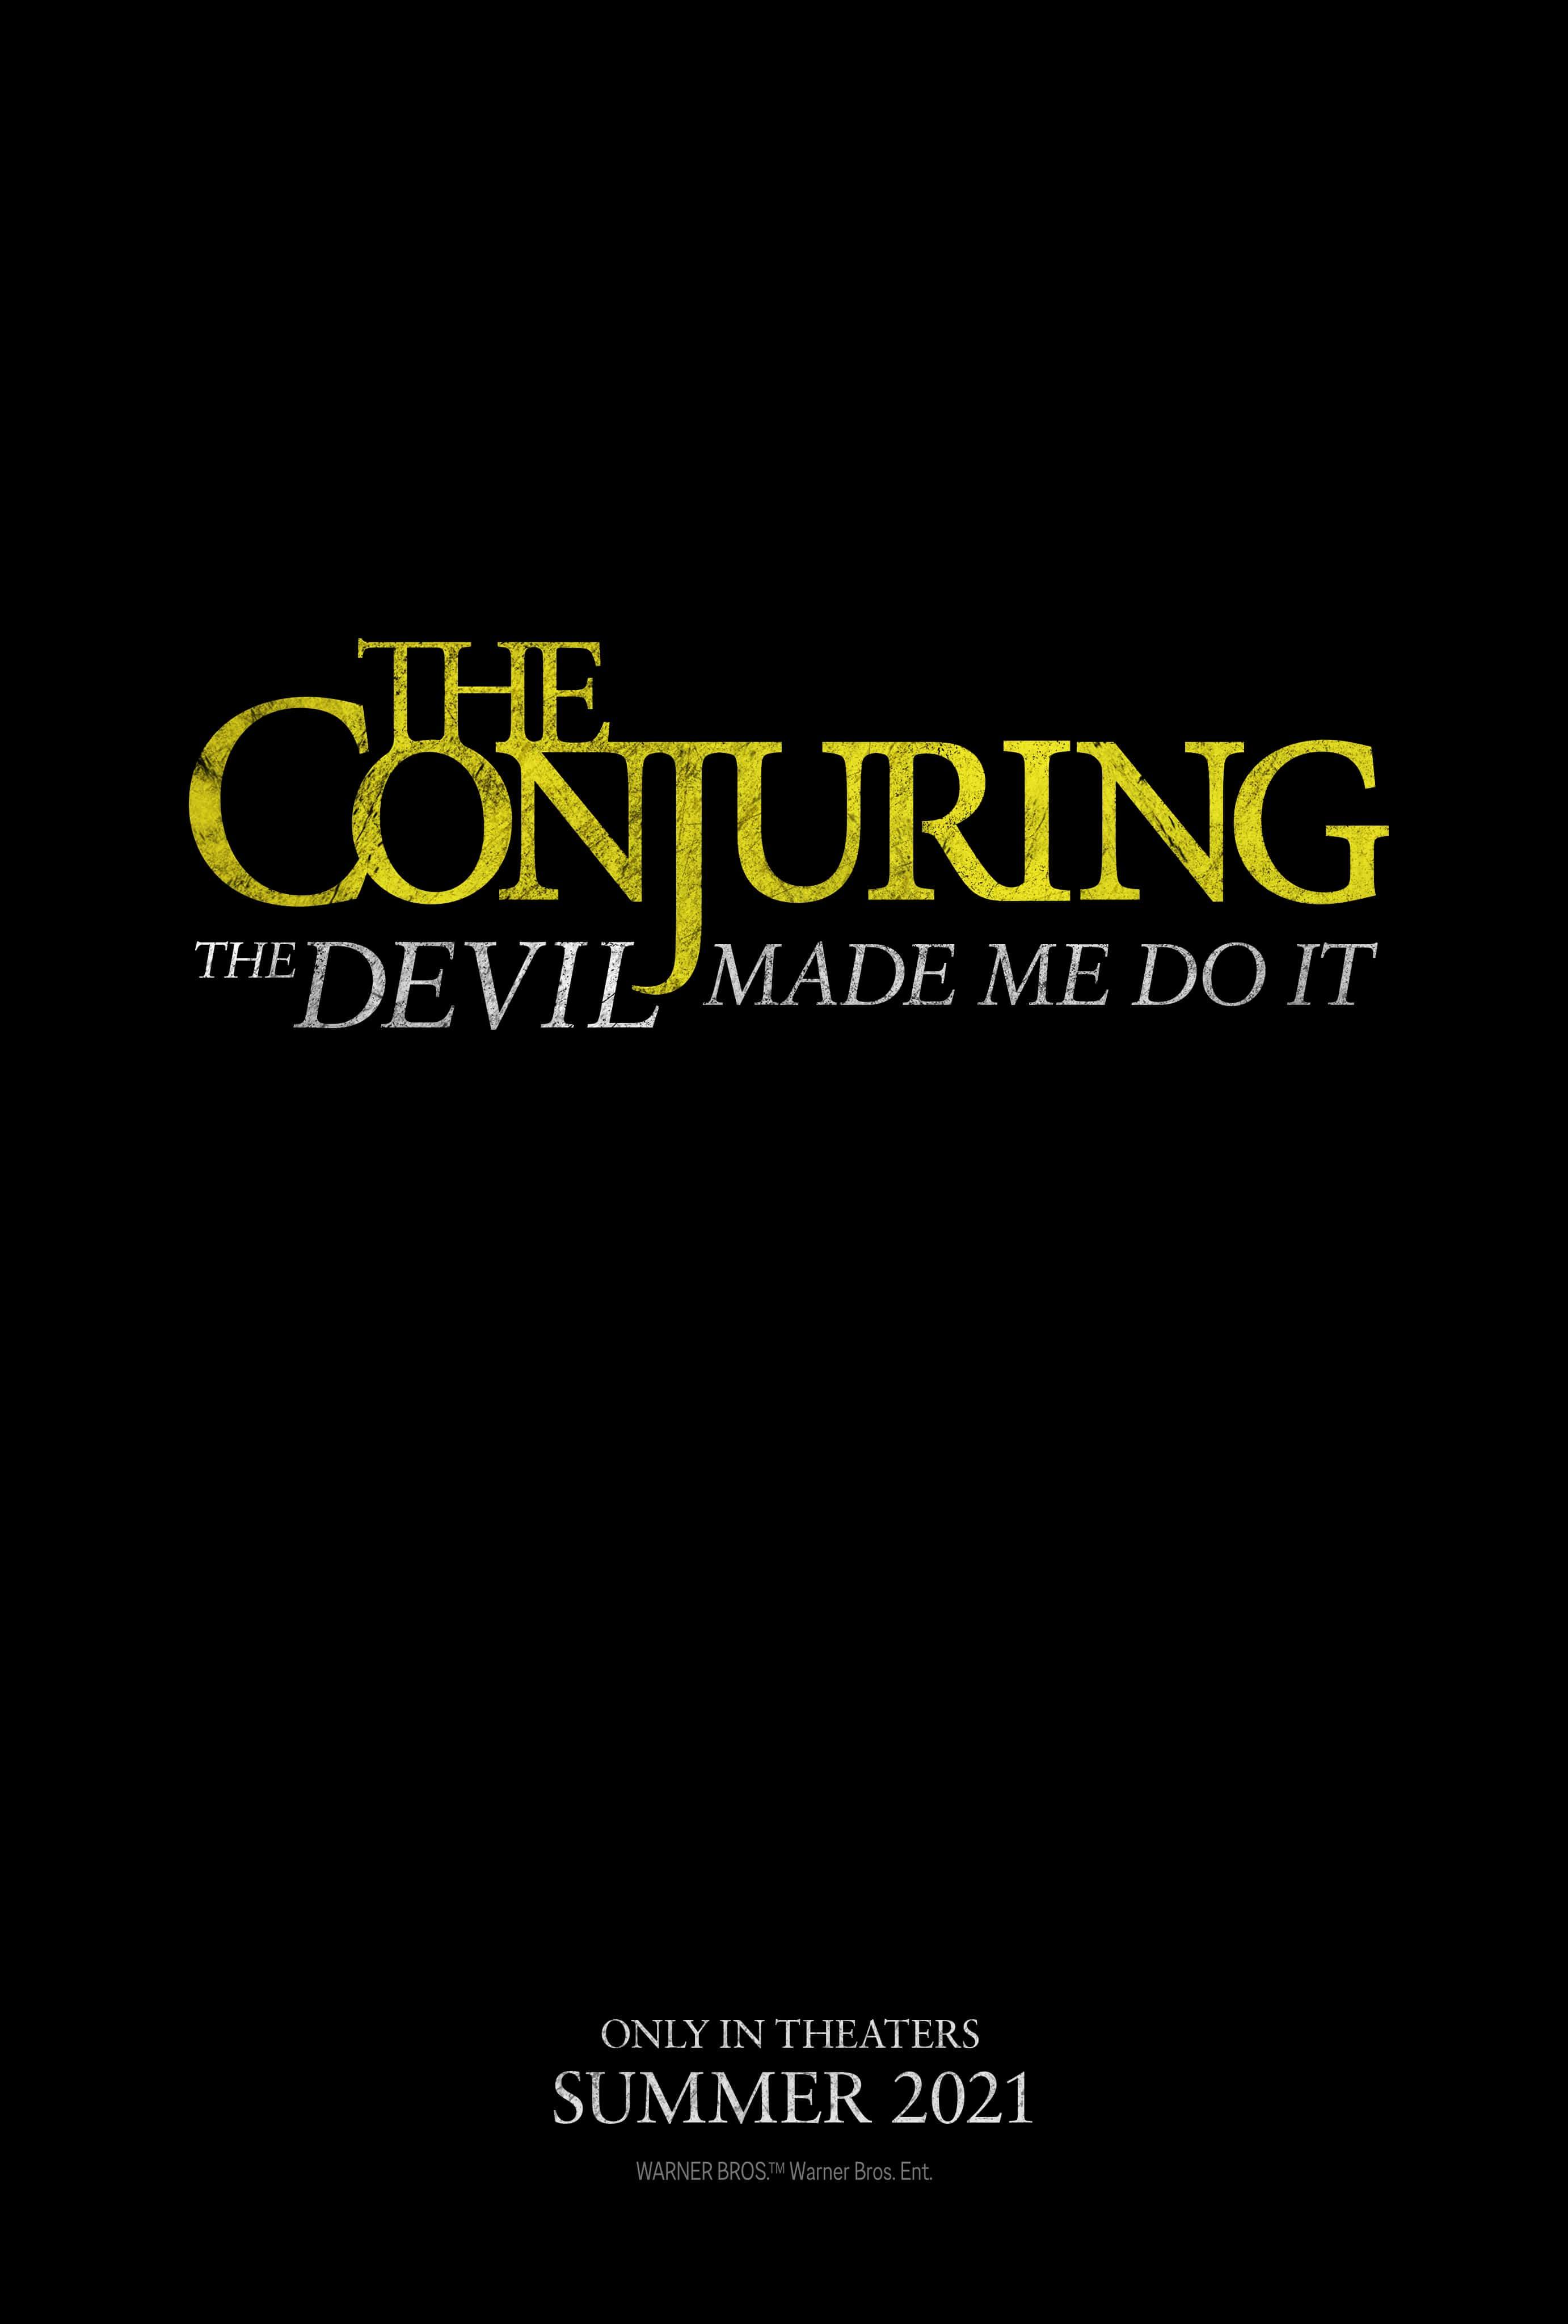 Trailer Alert! The Conjuring III